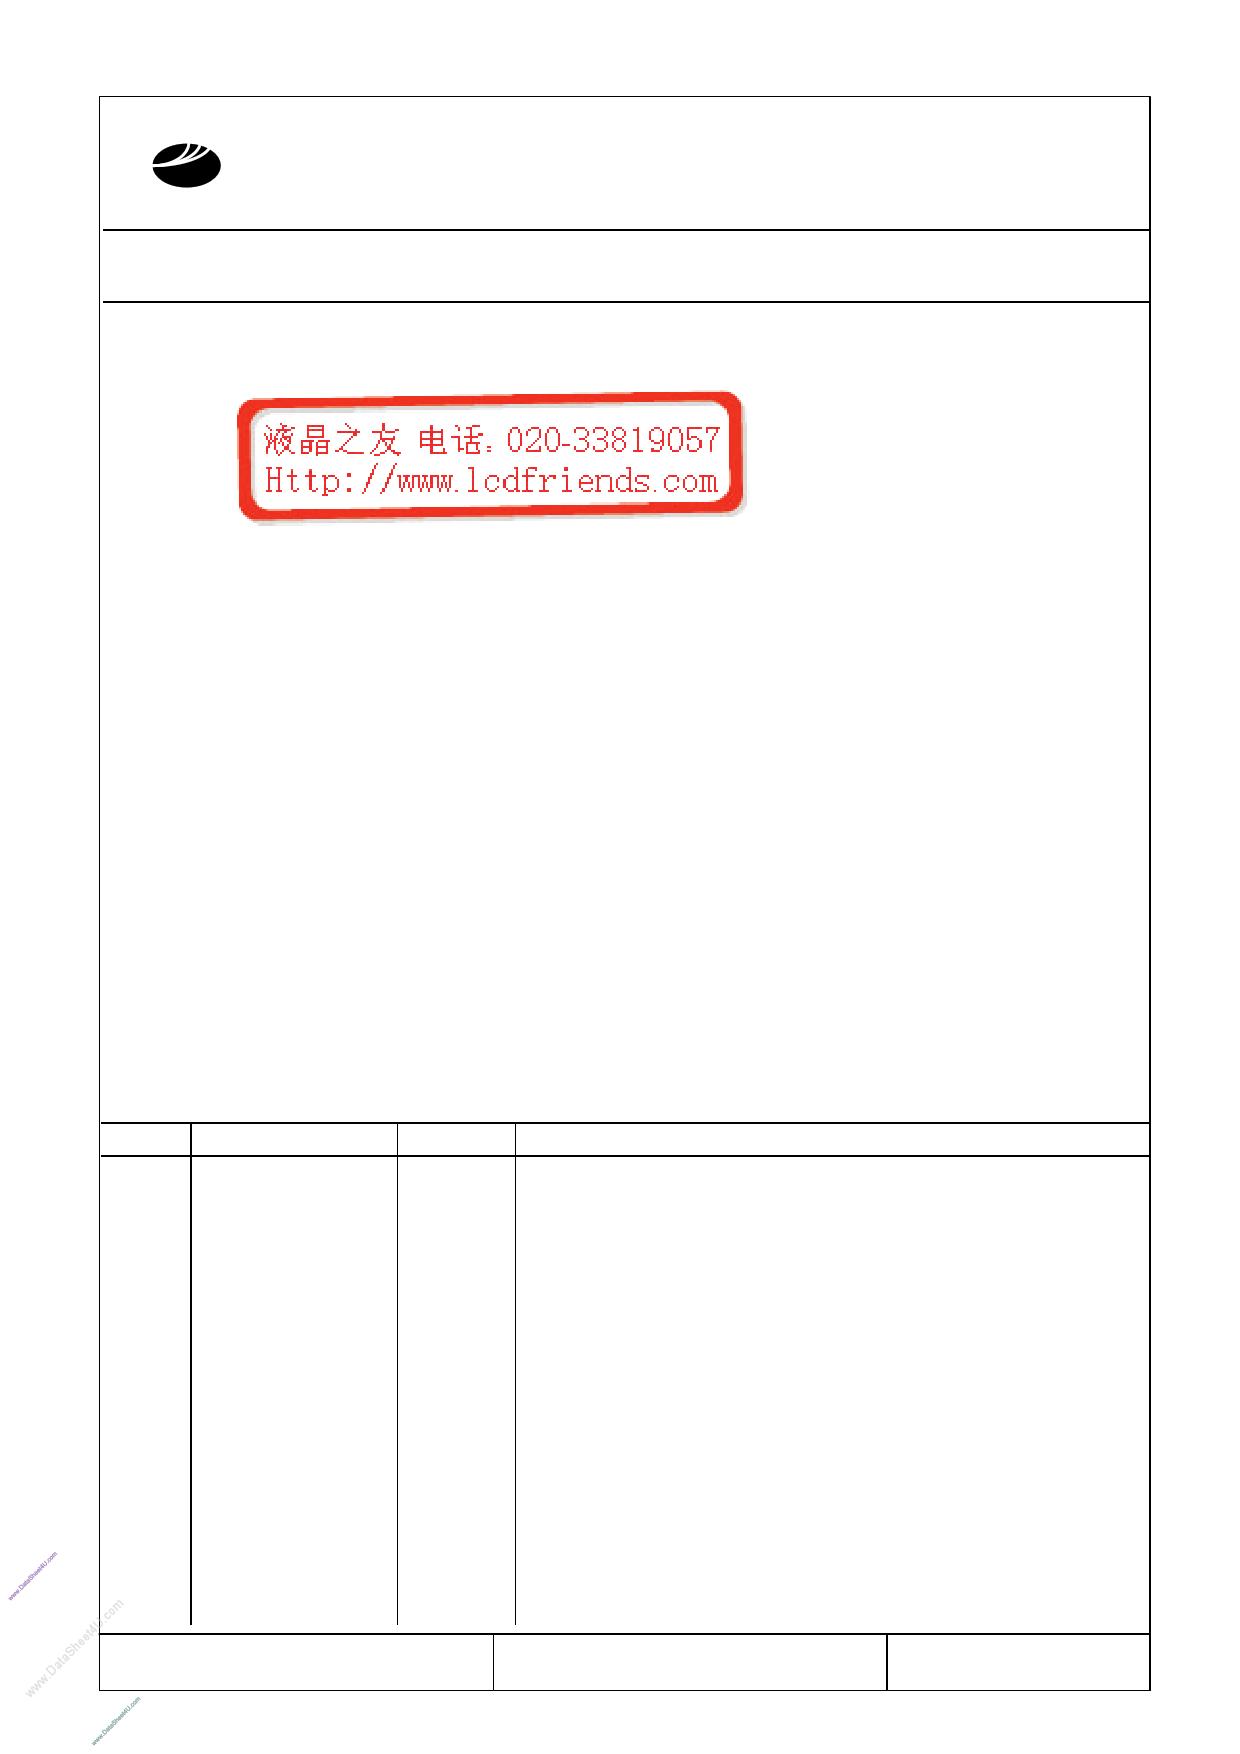 T-51382D064-FW-P-AB datasheet